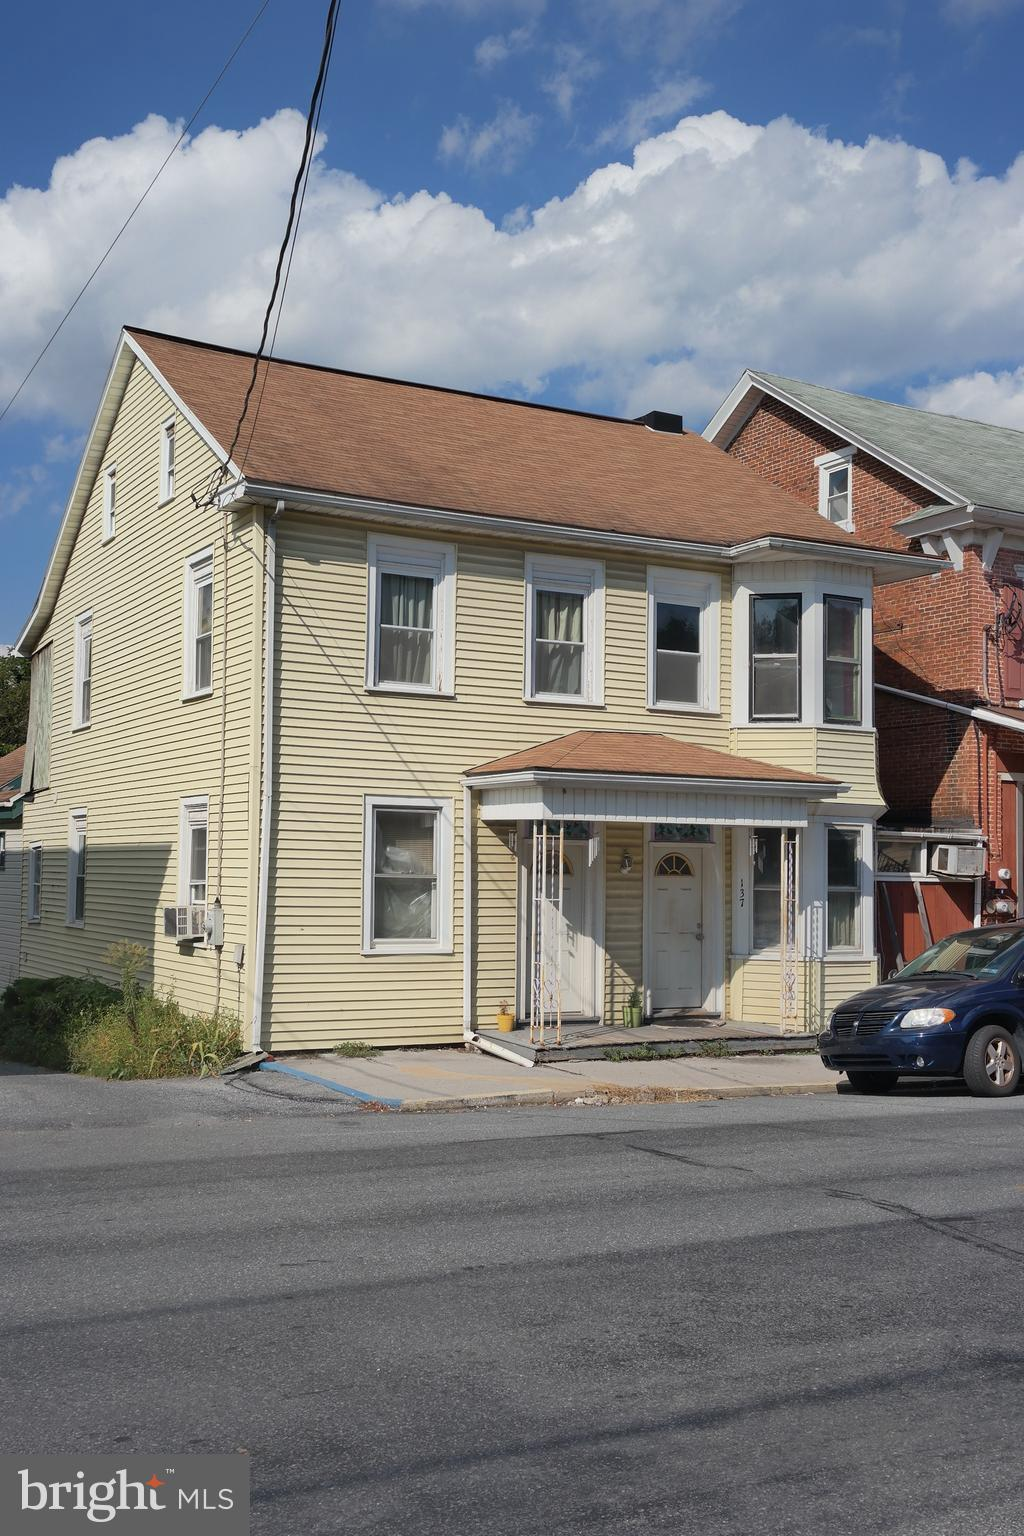 137 E MAIN STREET, FREDERICKSBURG, PA 17026